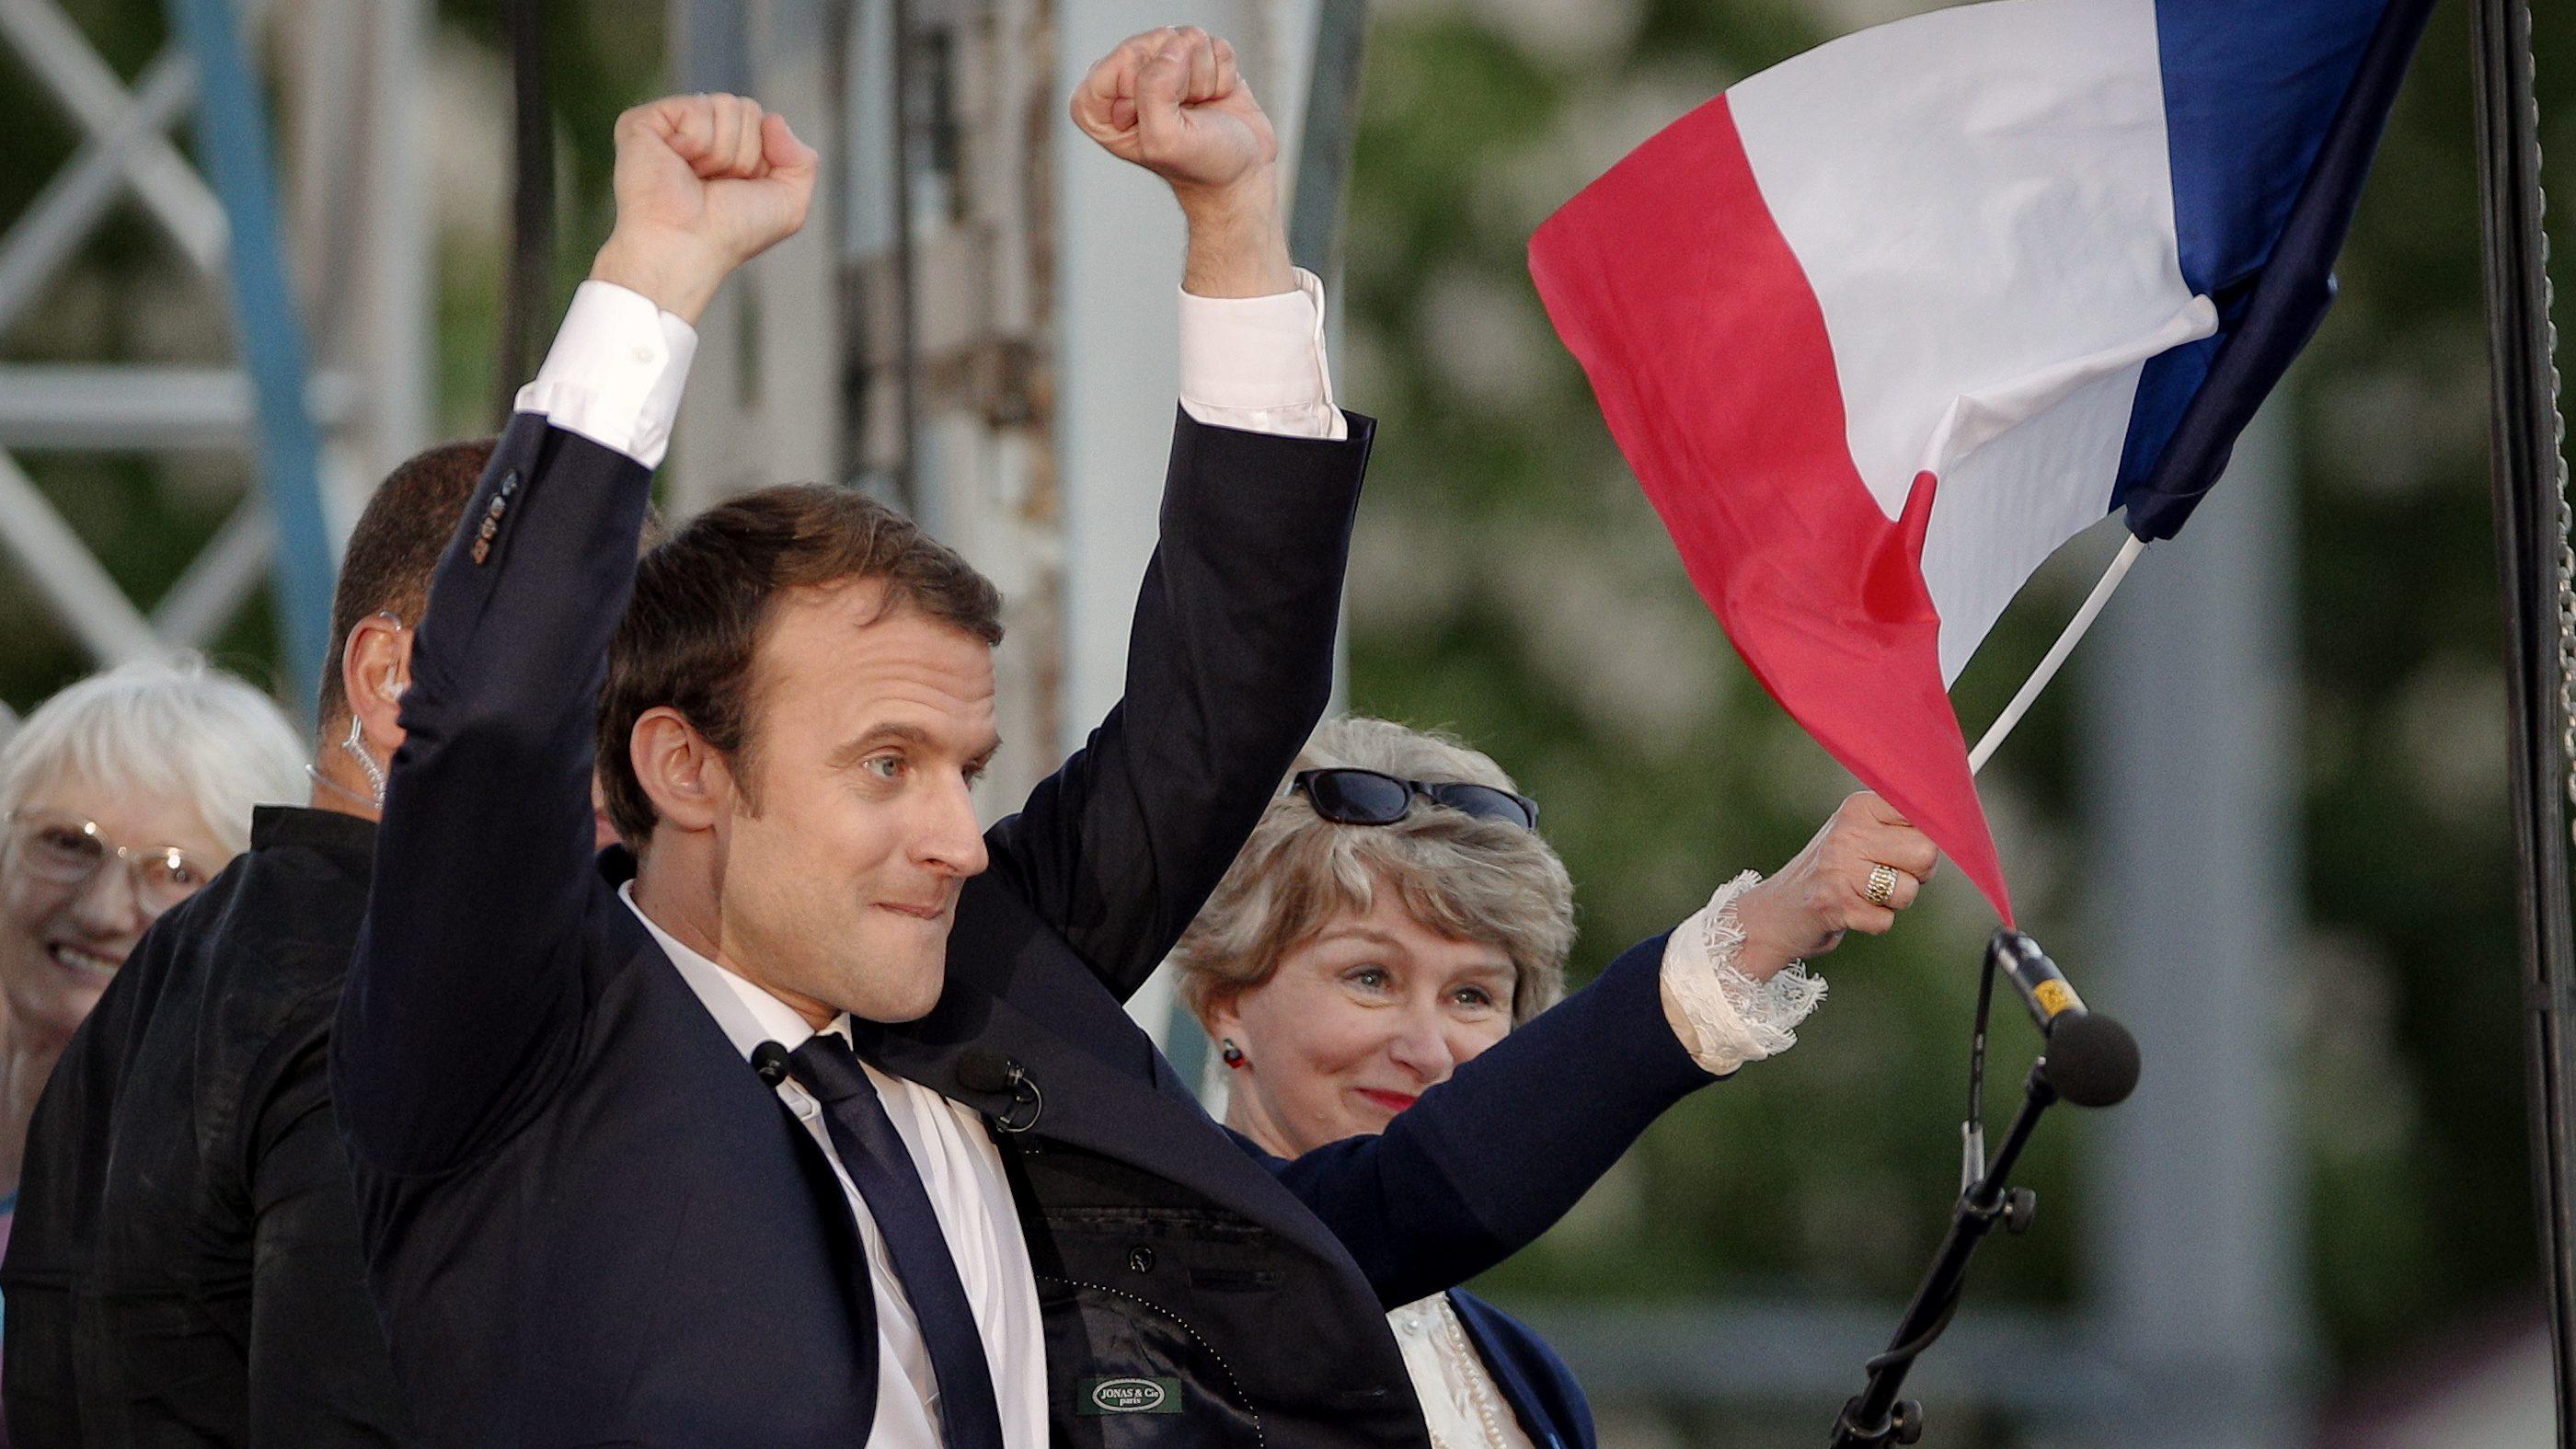 Emmanuel Macron has been described as a gay, fish-eyed, adder-like, tax-dodging psychopath